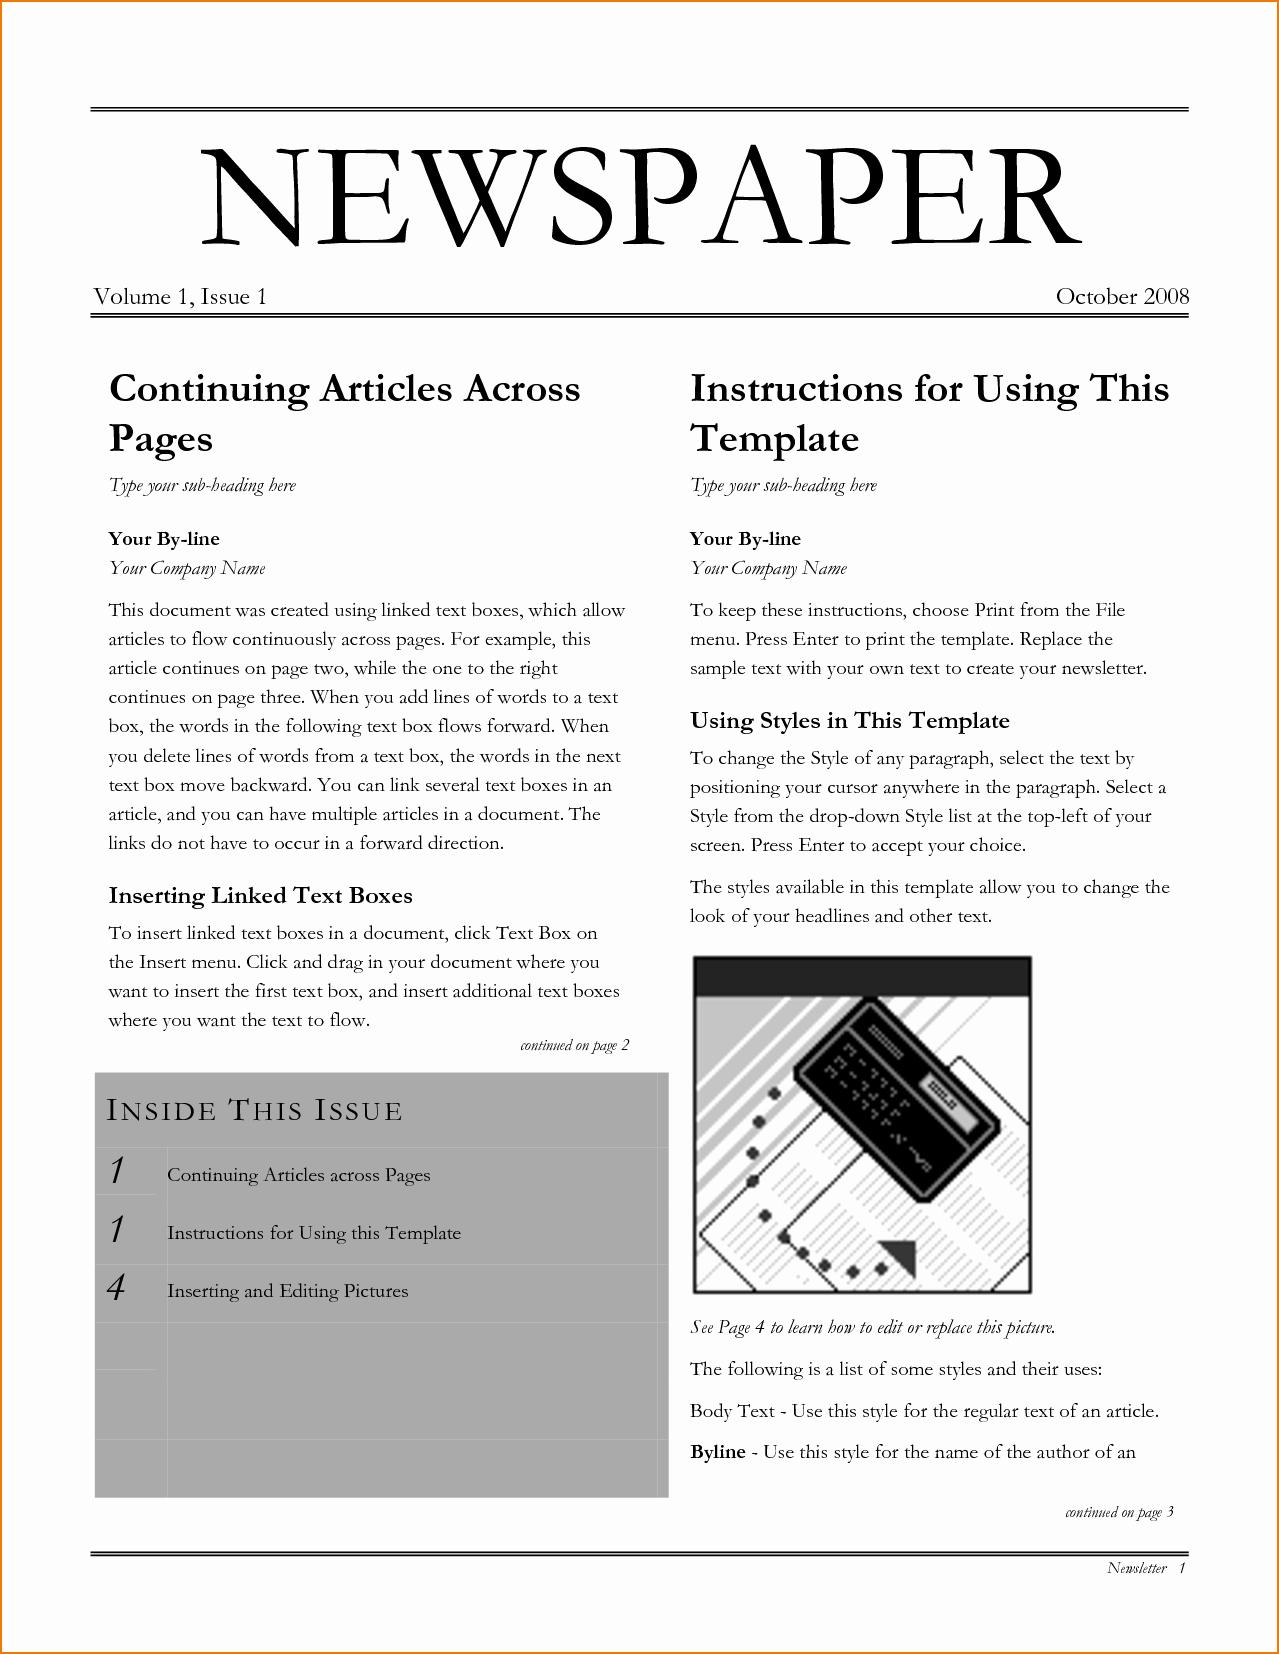 Newspaper Article Template Microsoft Word Best Of 6 Newspaper Template Word